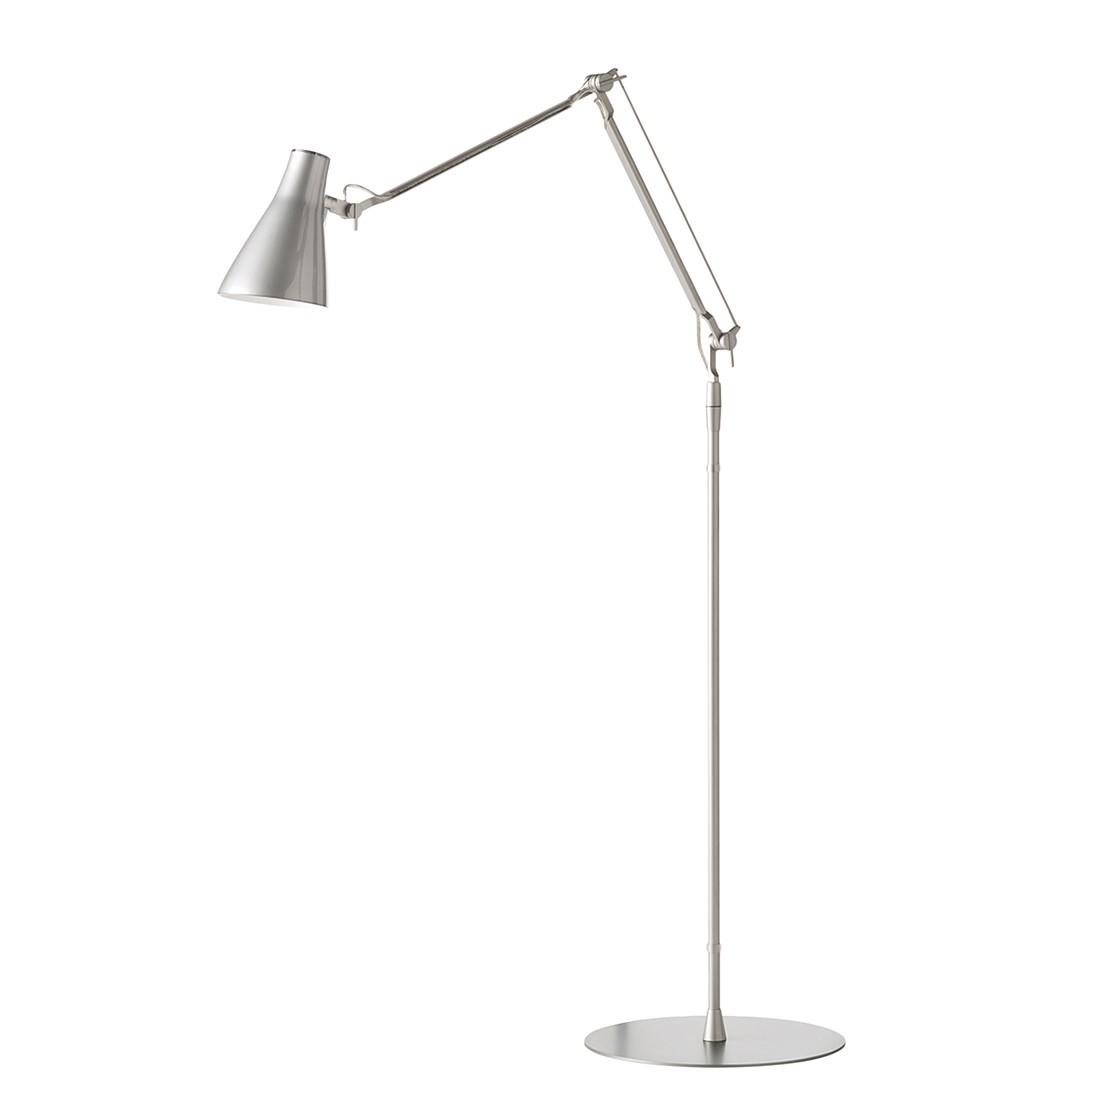 Stehleuchte Solus 2 ● Metall/Kunststoff ● Grau ● 1-flammig- Blanke Design A